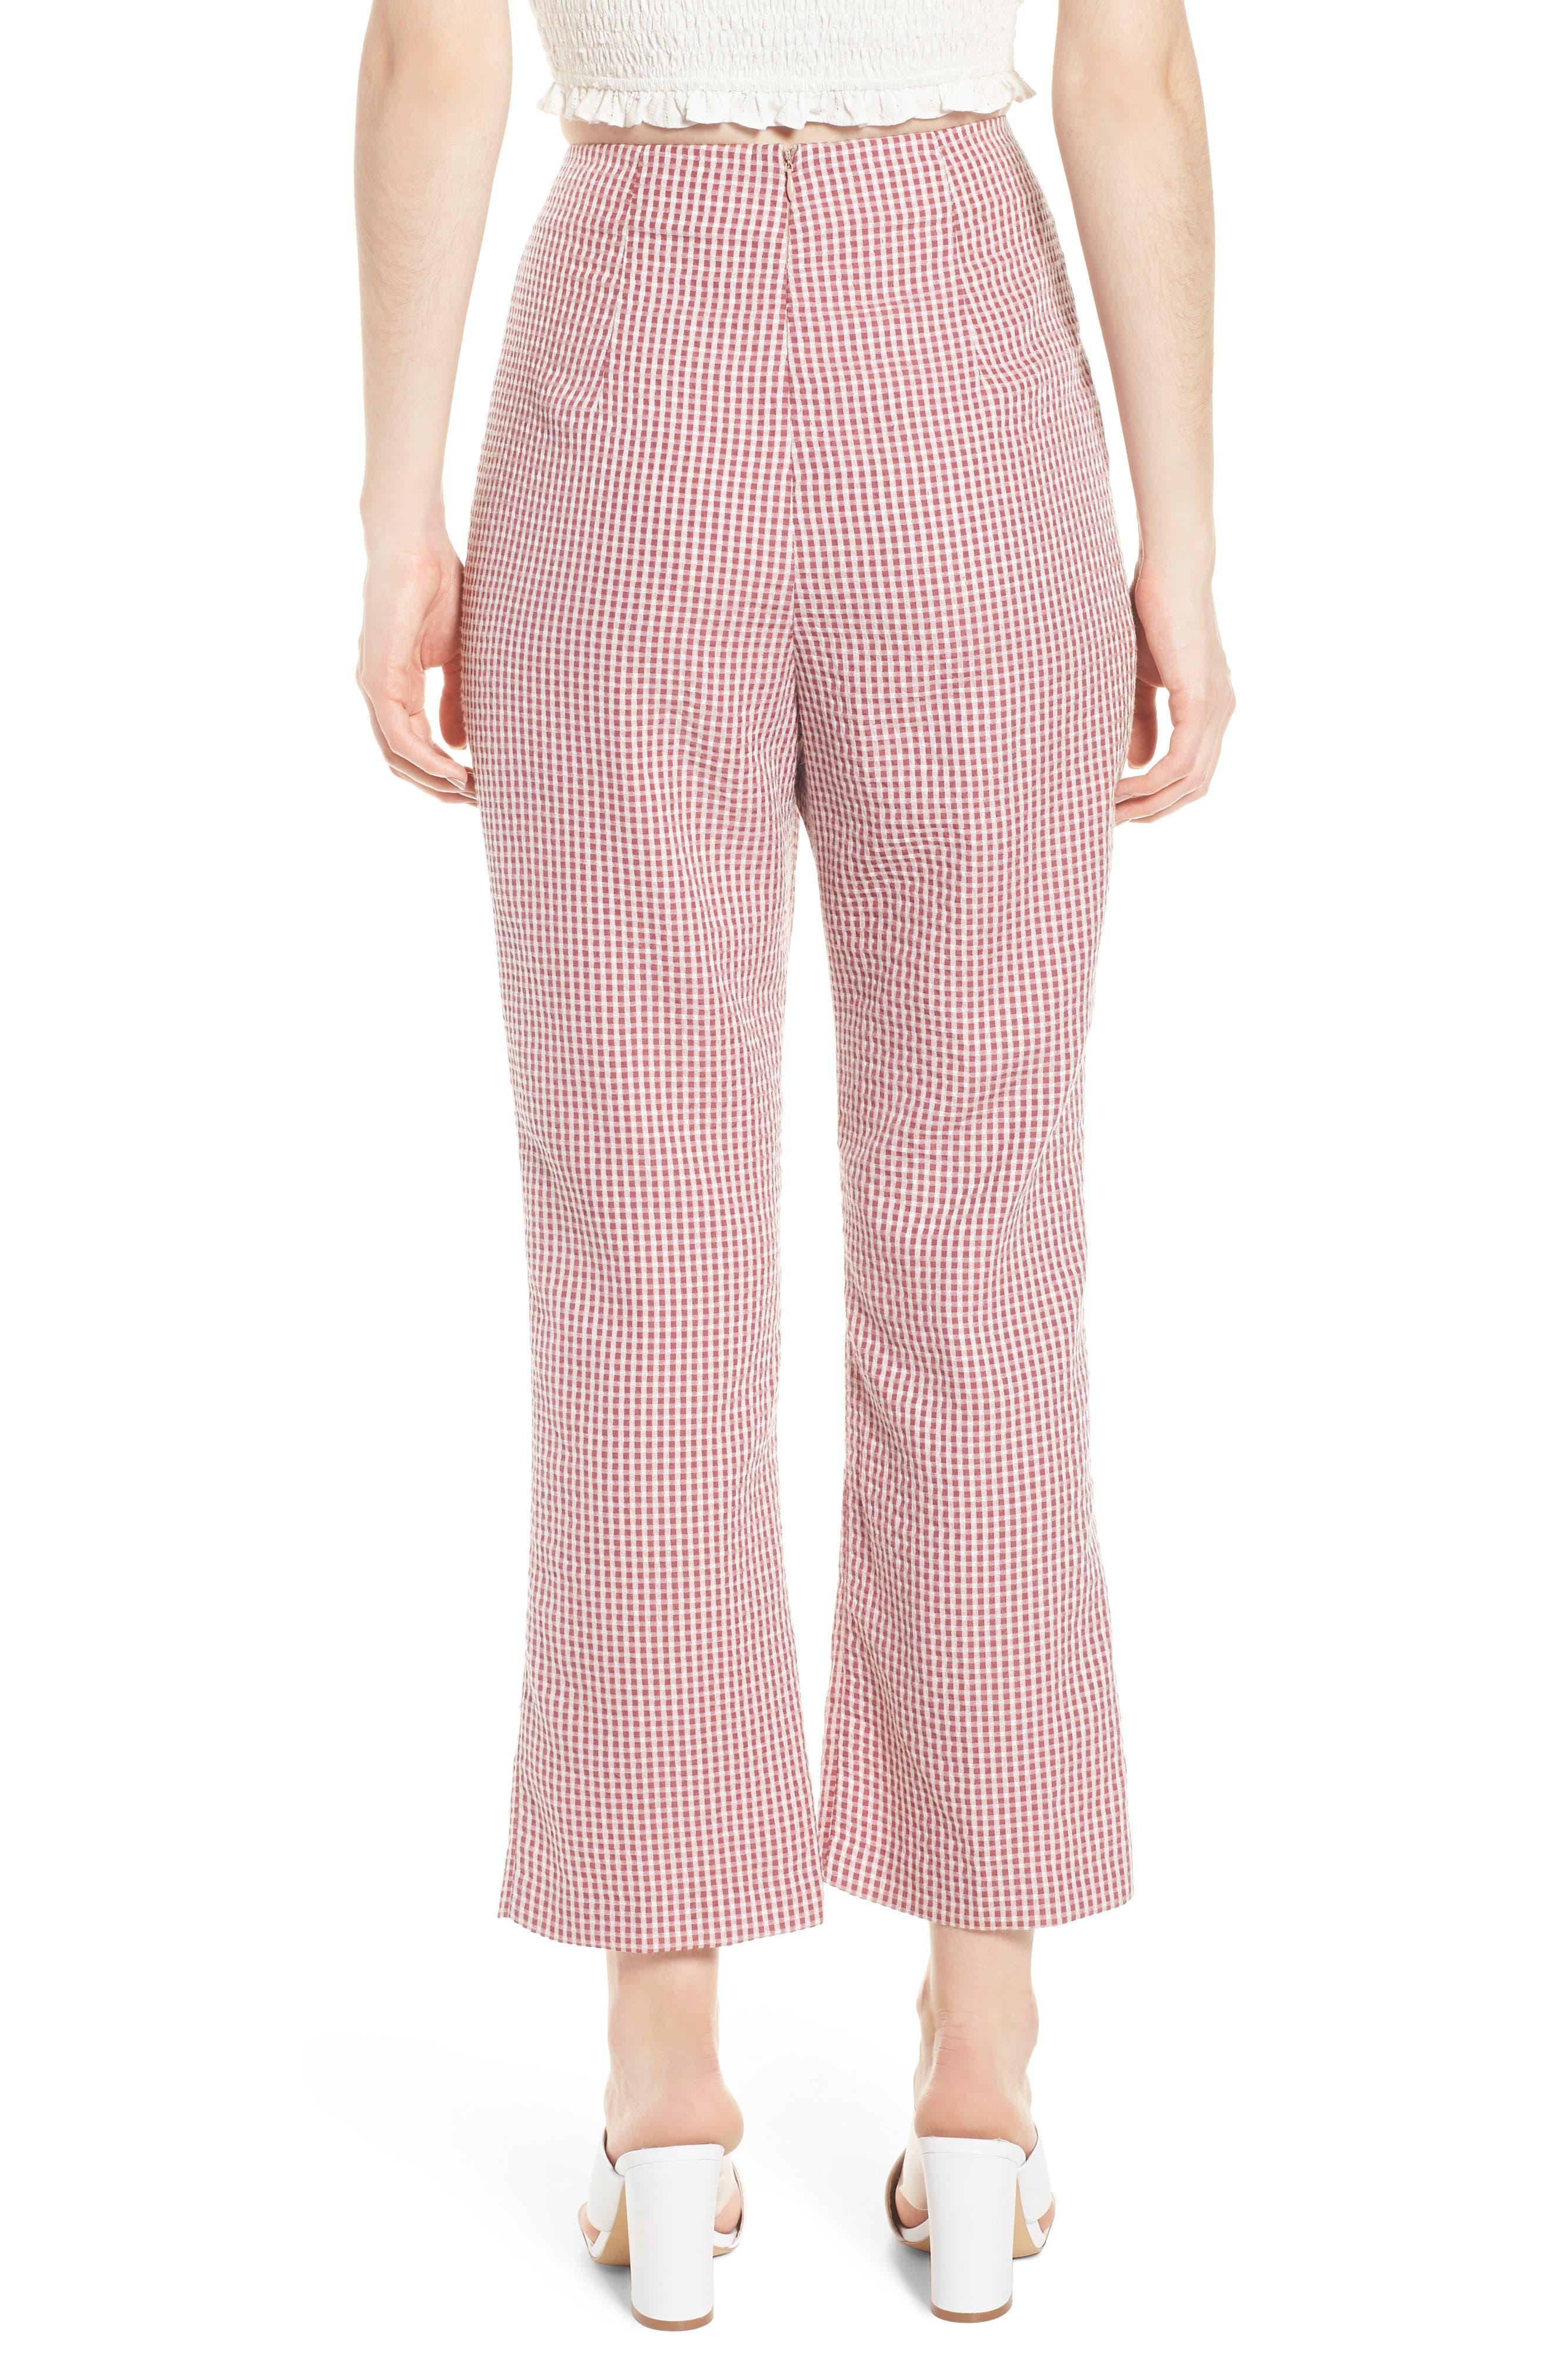 Pisa High Waist Crop Pants,                             Alternate thumbnail 2, color,                             RED GINGHAM